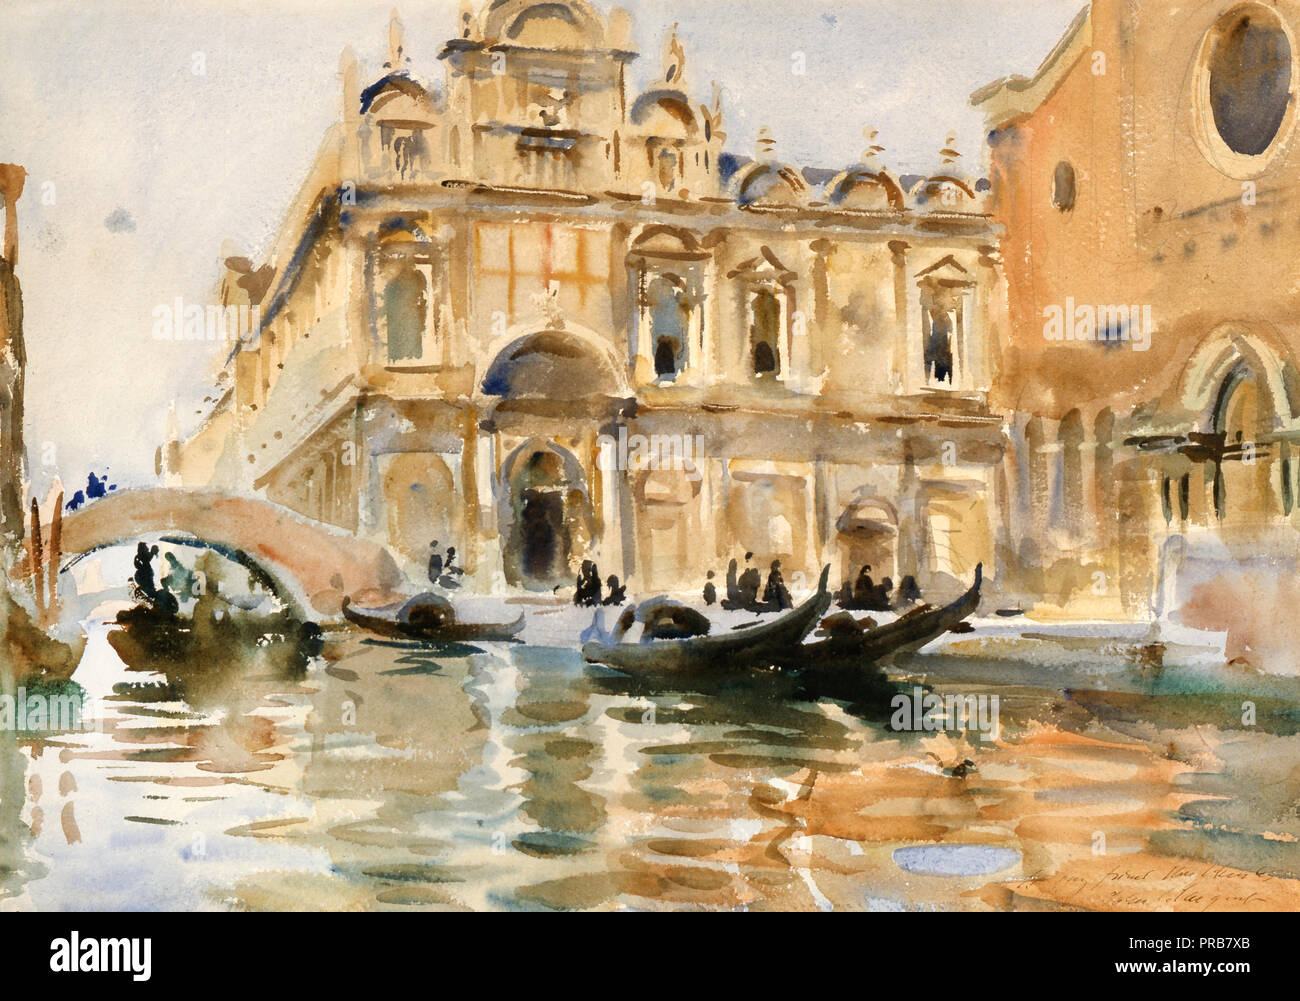 John Singer Sargent, Rio dei Mendicanti, Venice, Circa 1909, Watercolor, Indianapolis Museum of Art, USA. Stock Photo